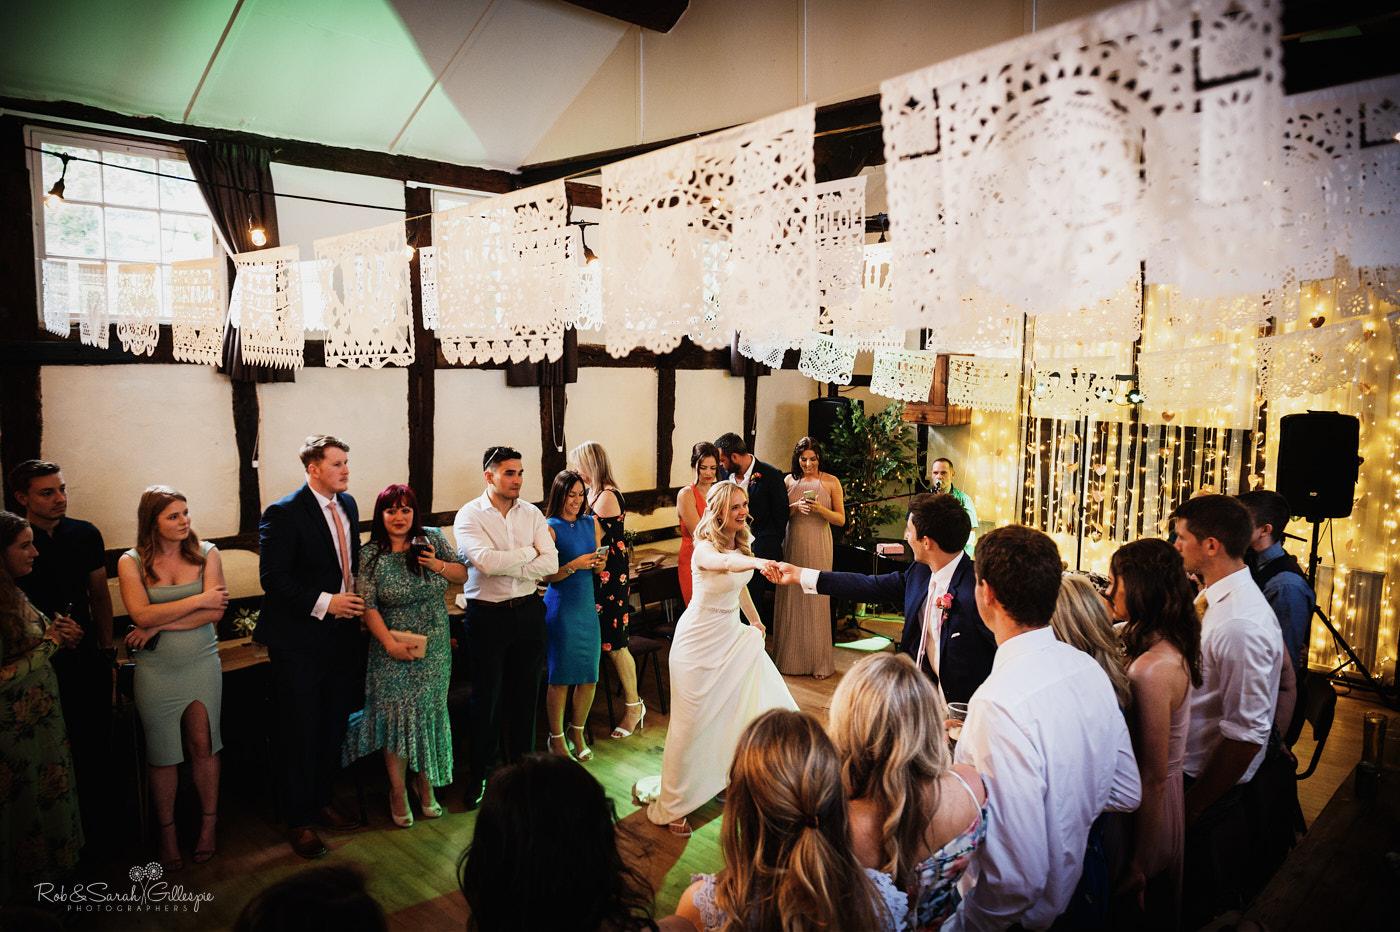 Belbroughton Church Hall wedding dancing